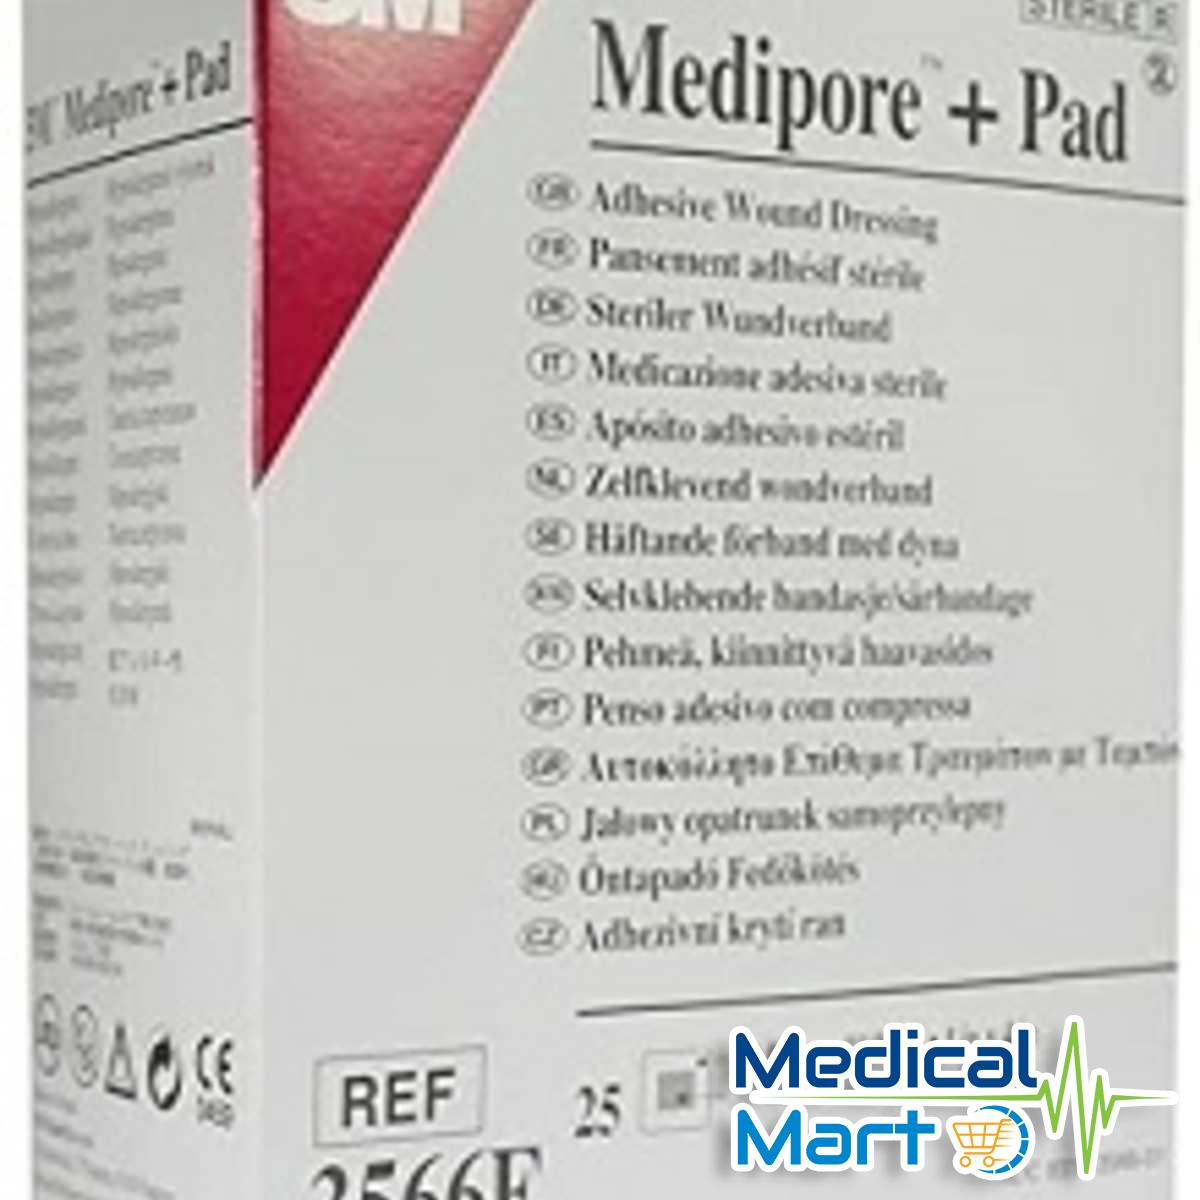 3m Medipore + Pad Soft Cloth Adhesive Wound Dressing, 3566e (10cm x 10cm)